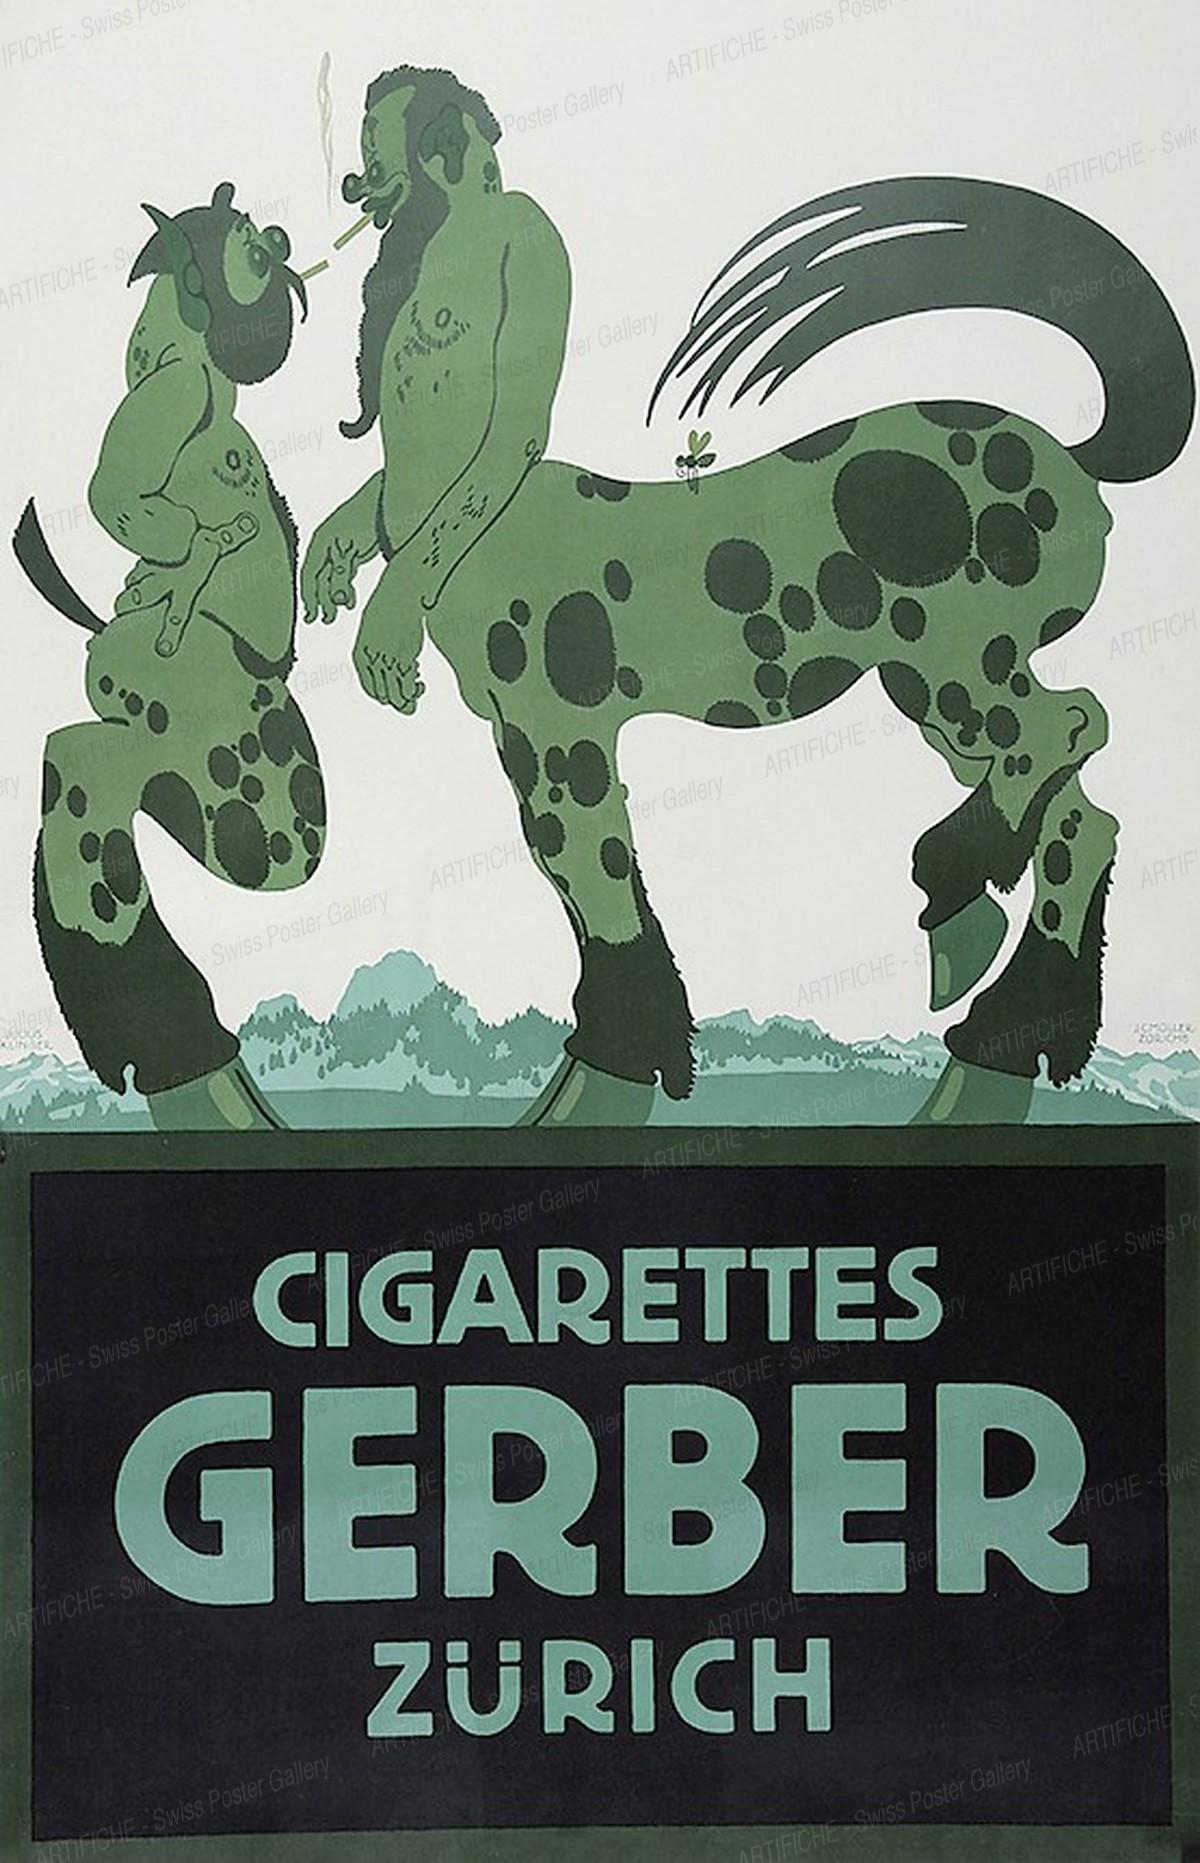 Cigarettes Gerber Zürich, Julius Klingler